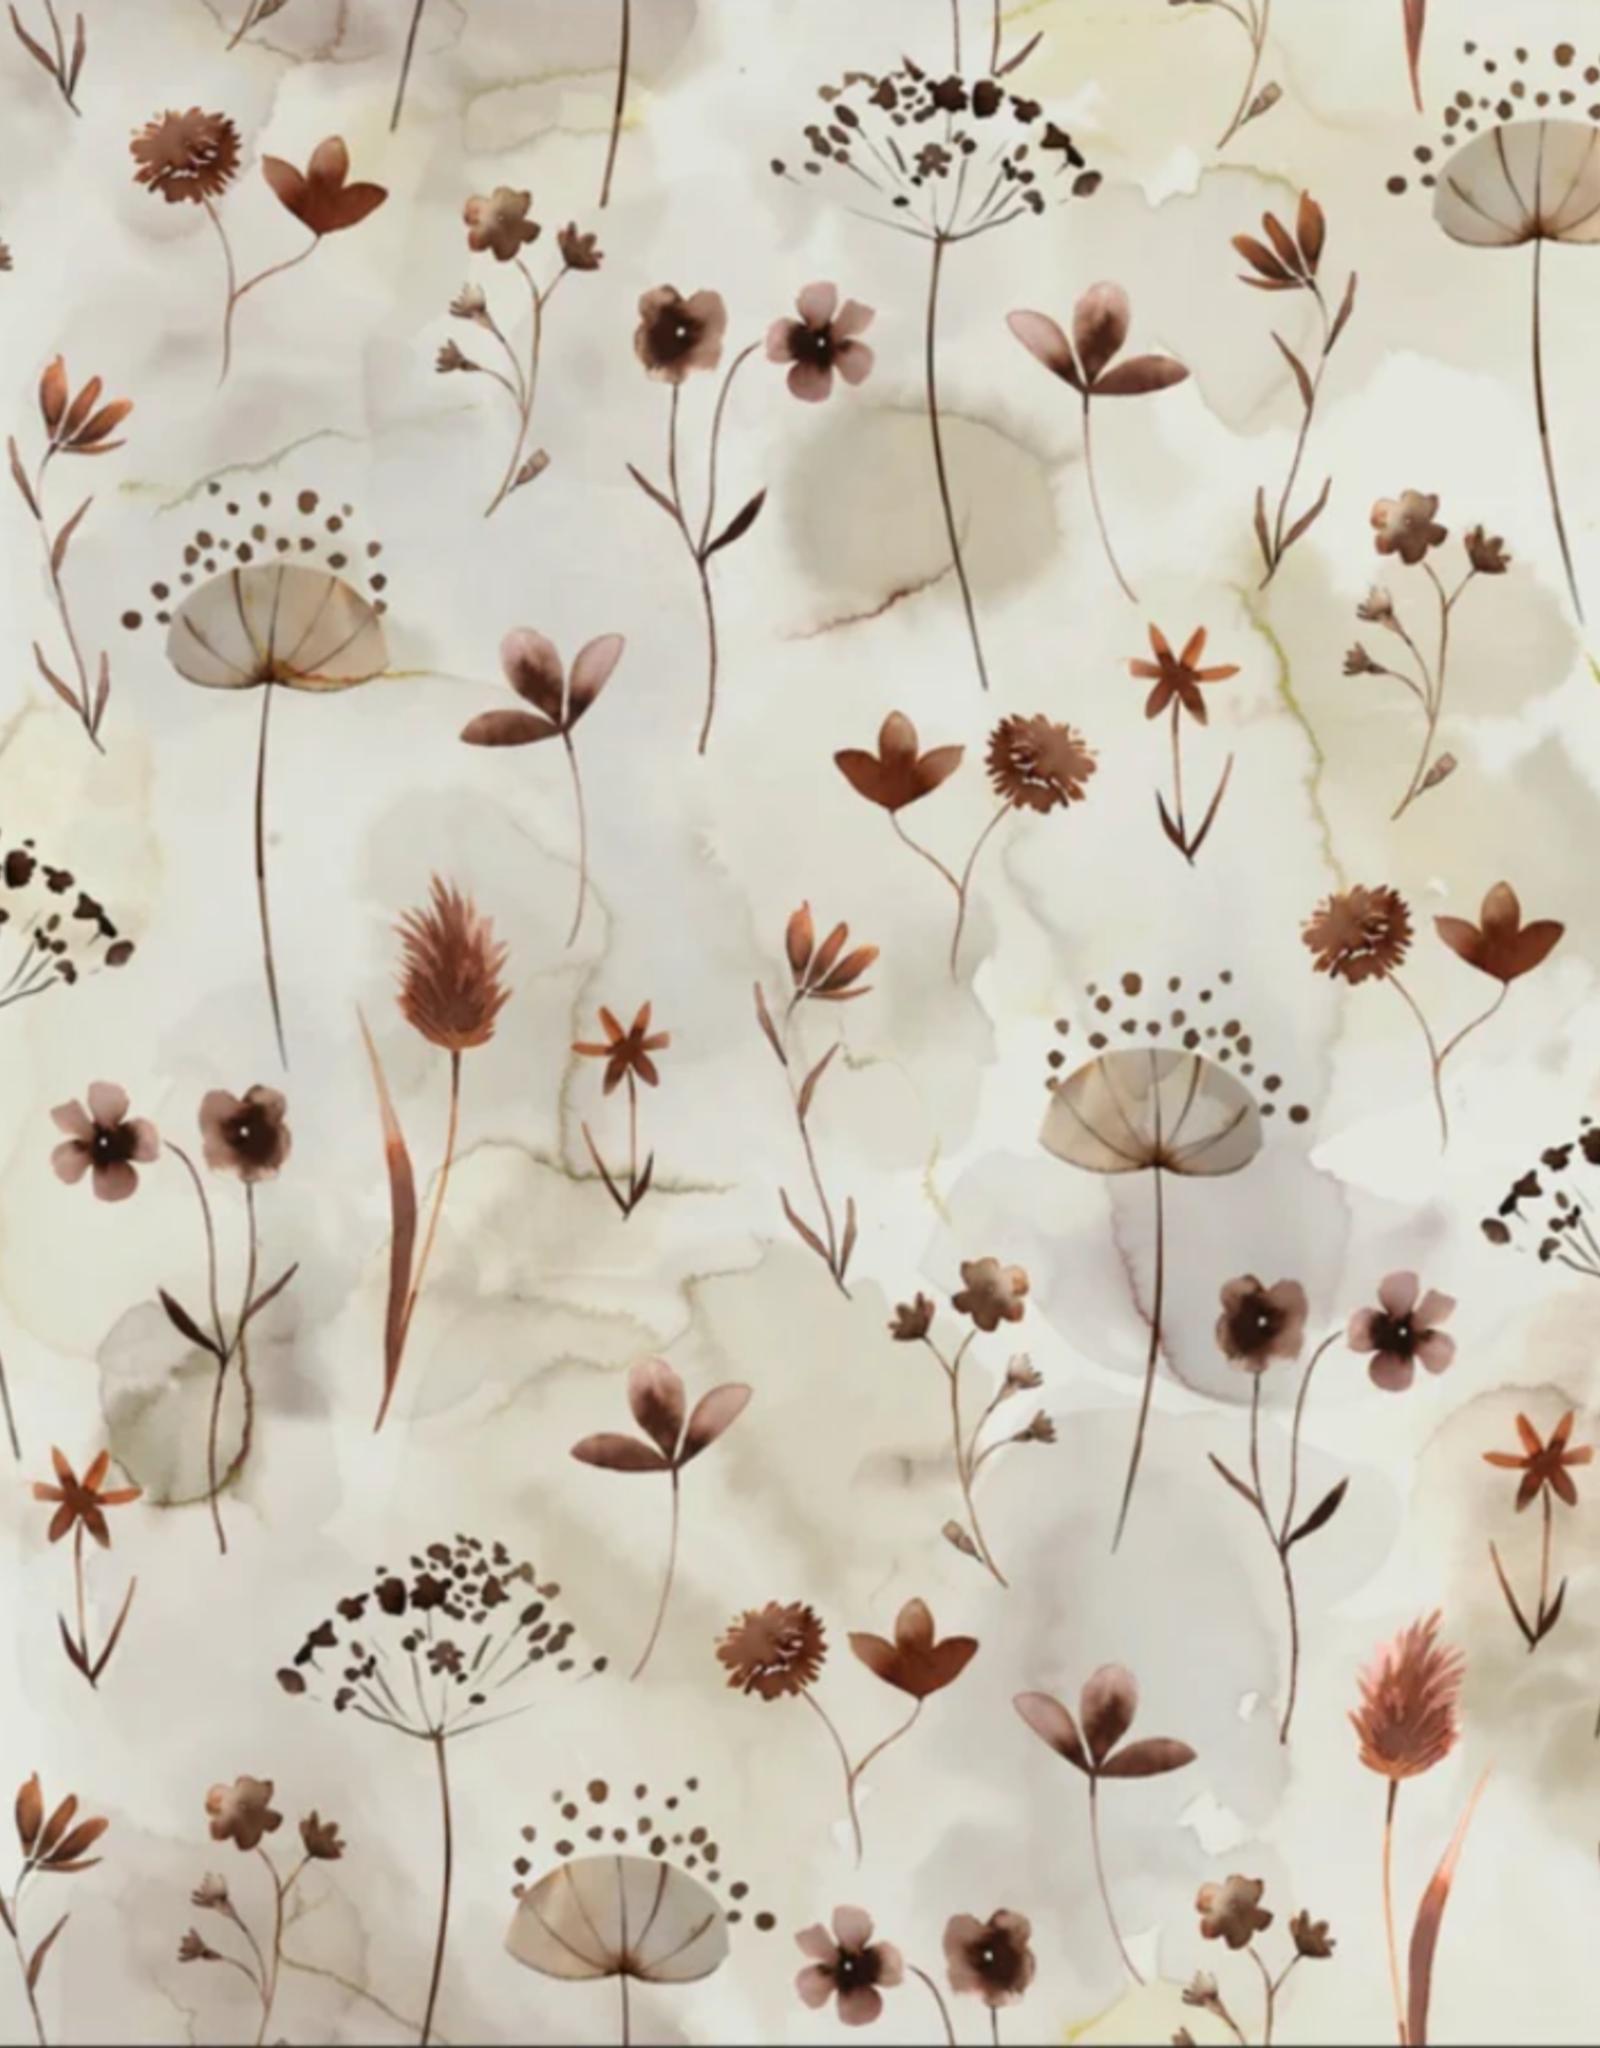 Family Fabrics Tricot - Family Fabrics - Pressed Flowers